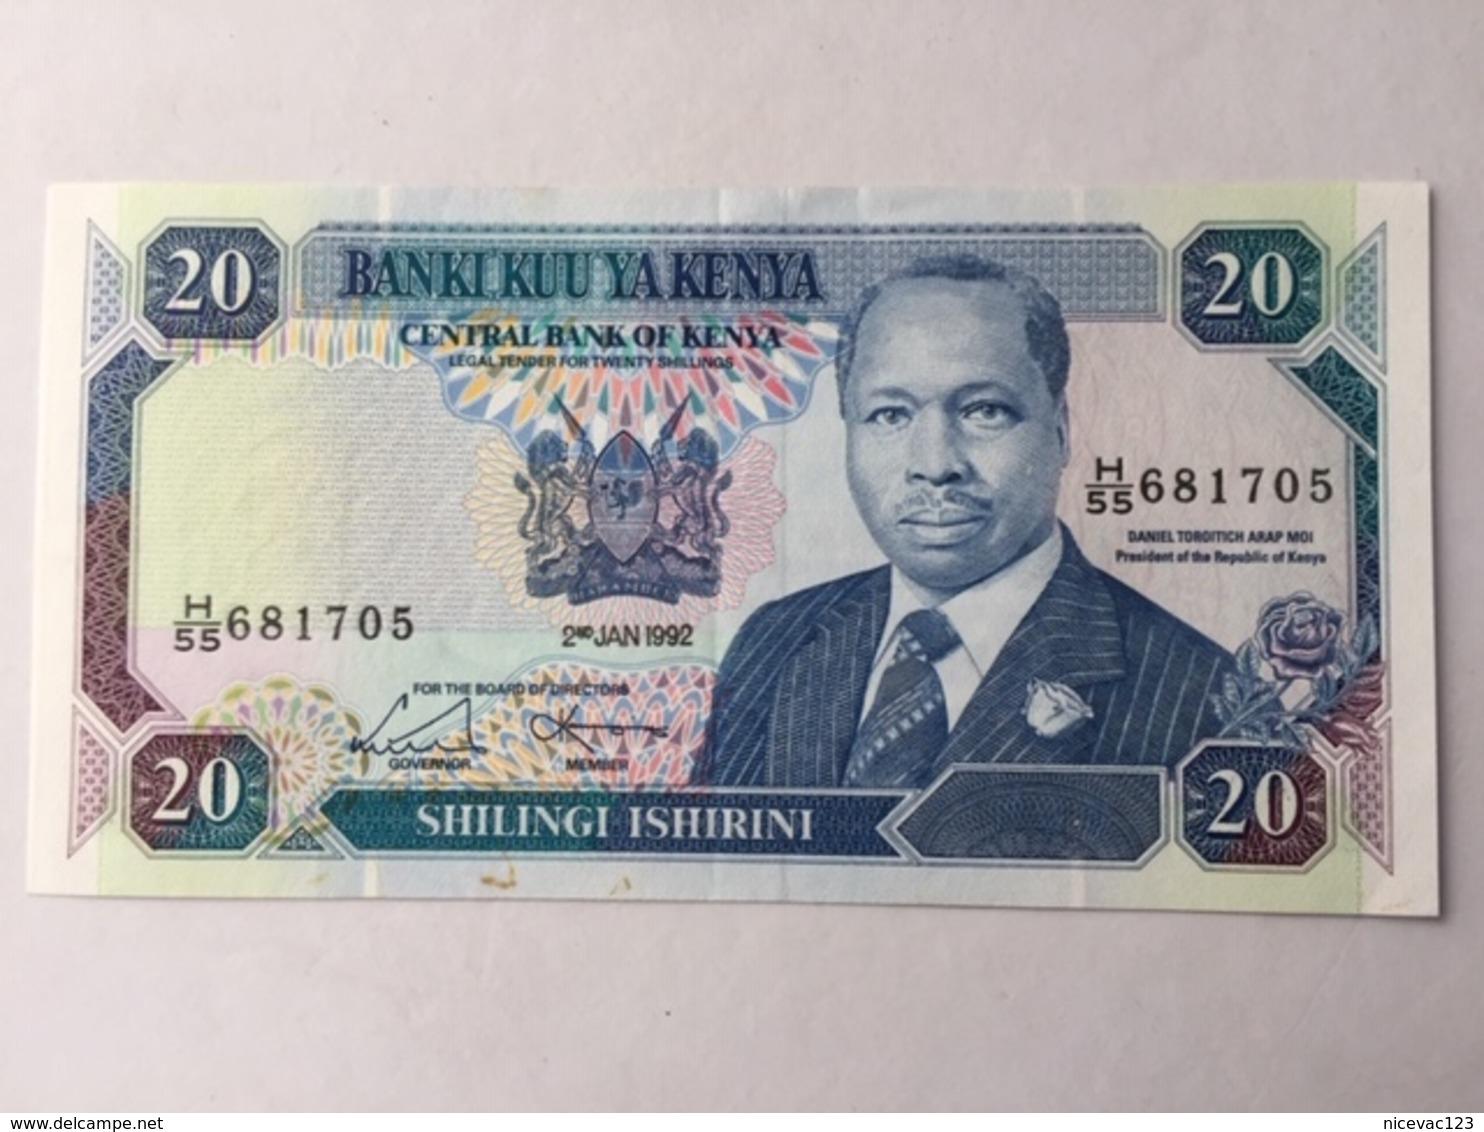 KENYA P25 20 SHILLING 1.7.1992 UNC - Kenia